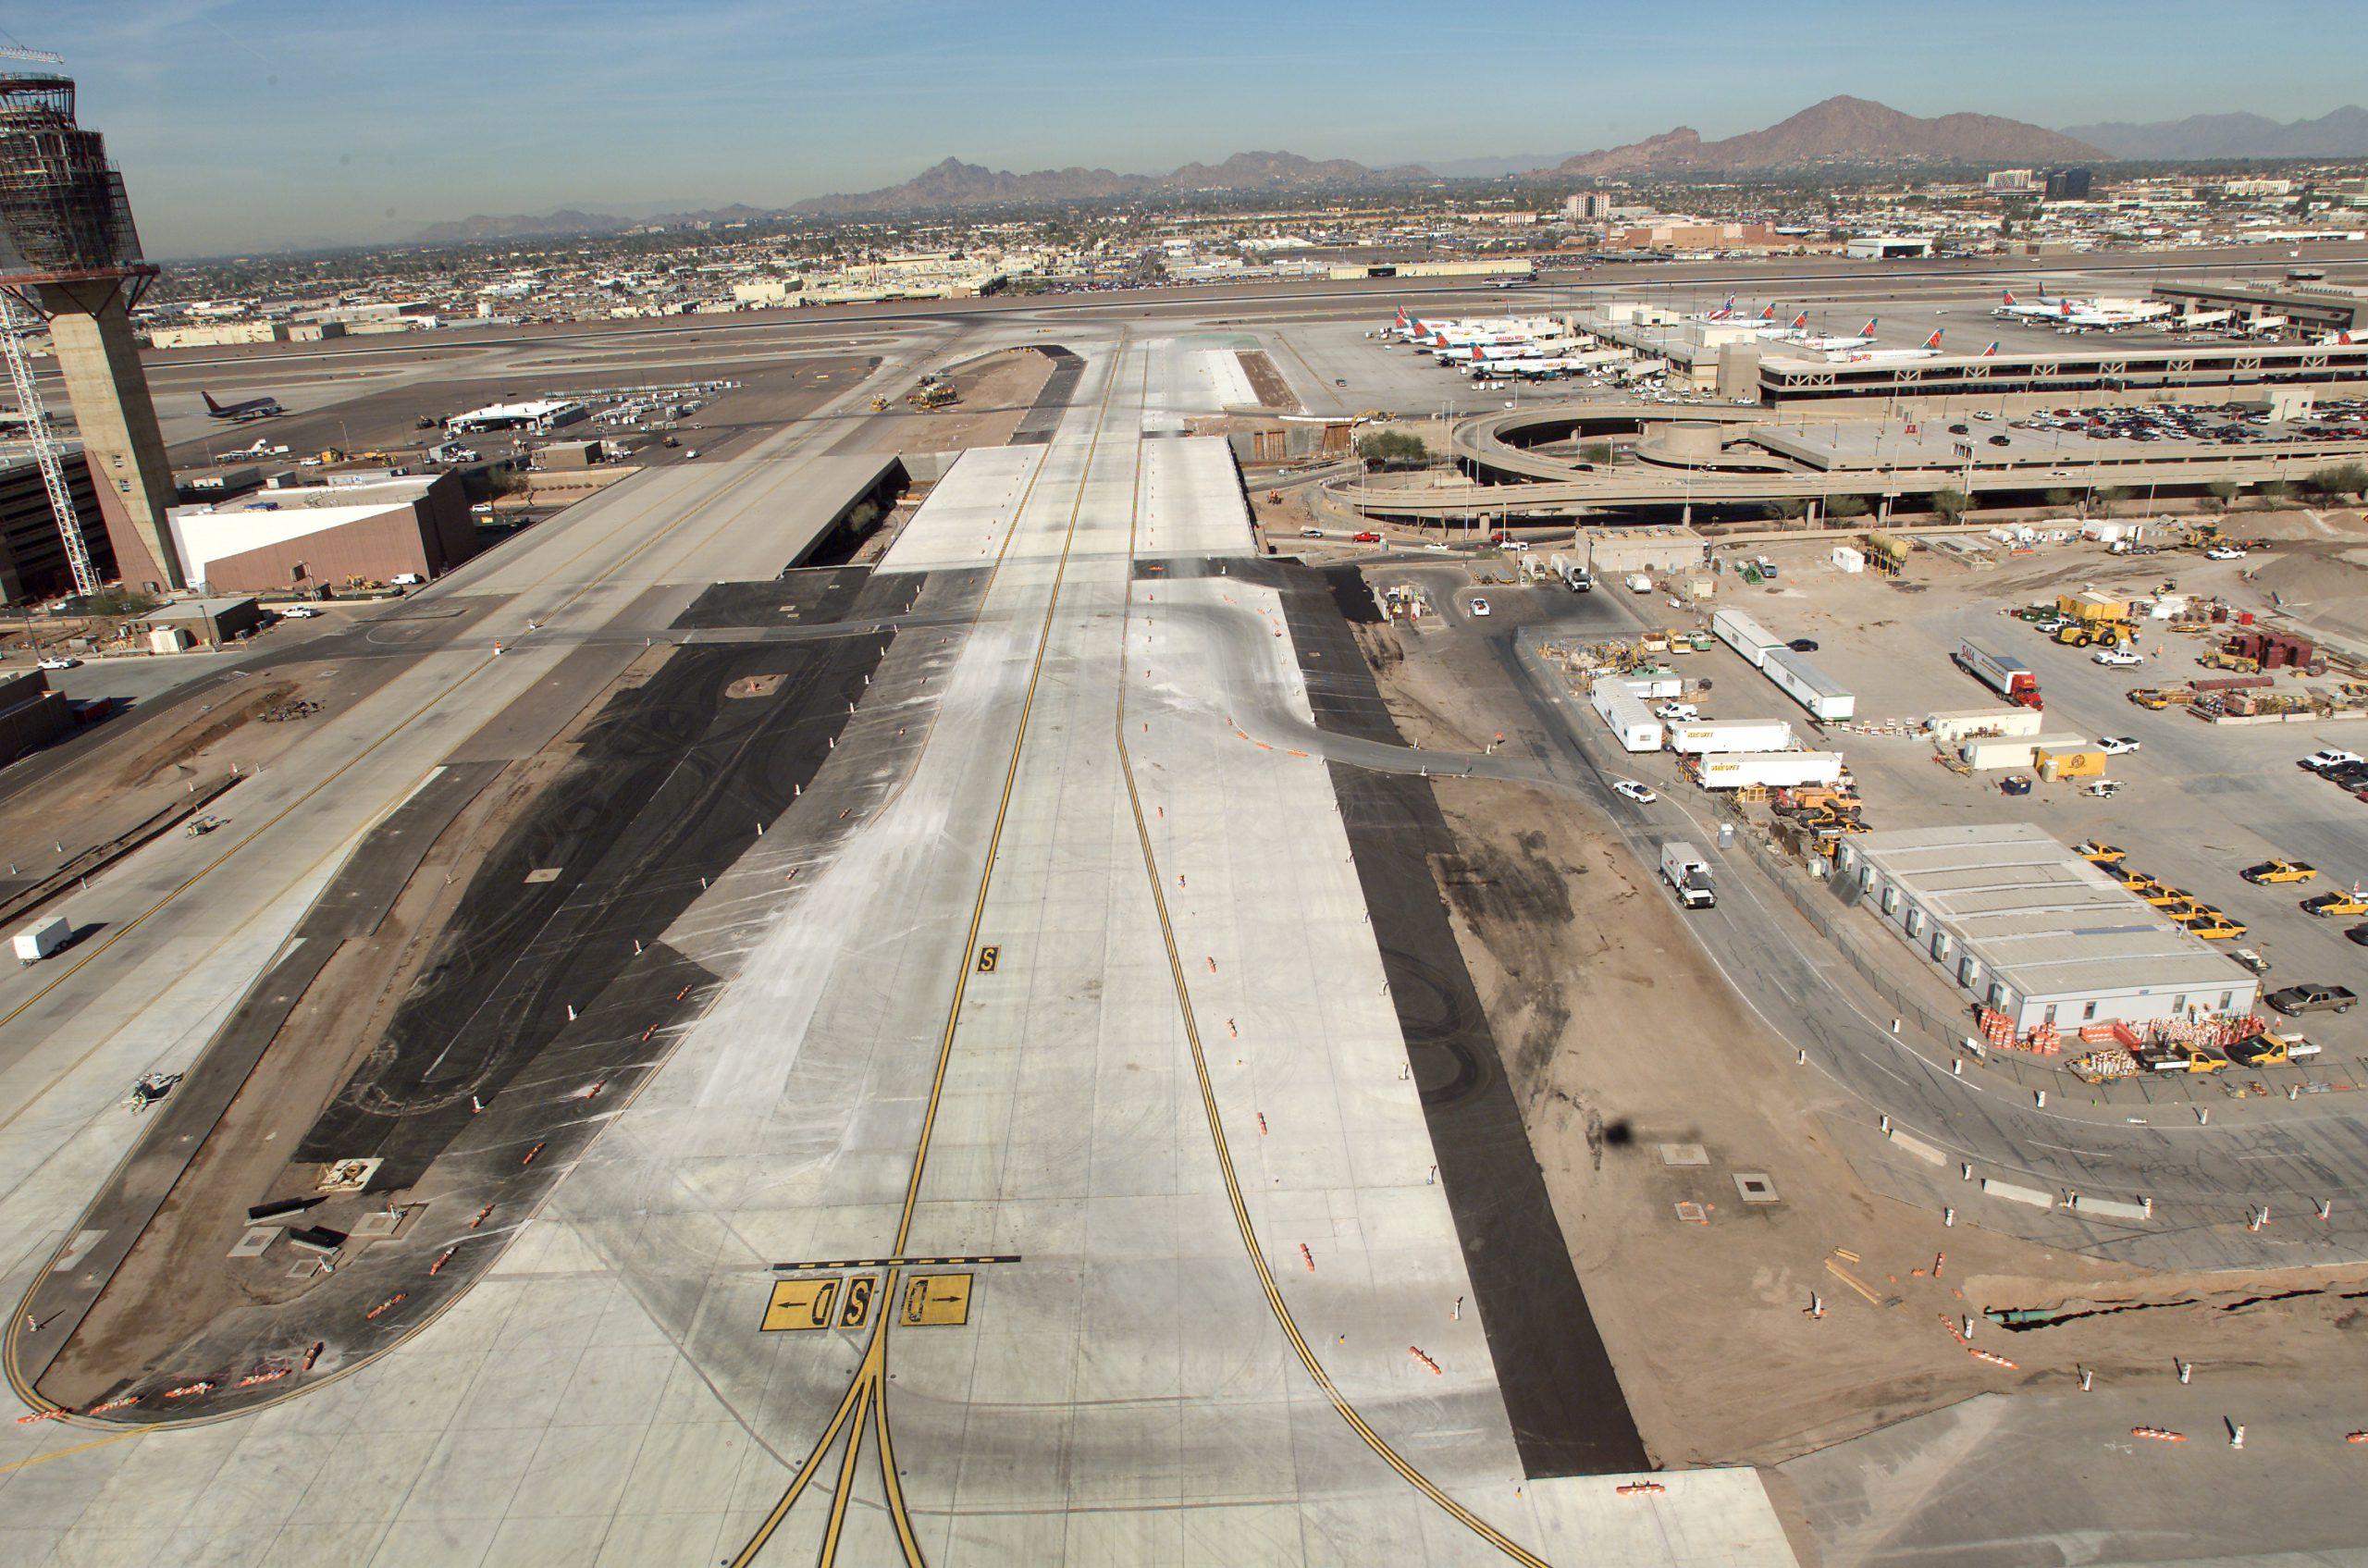 Phoenix Sky Harbor International Airport Taxiway S Reconstruction and Bridge